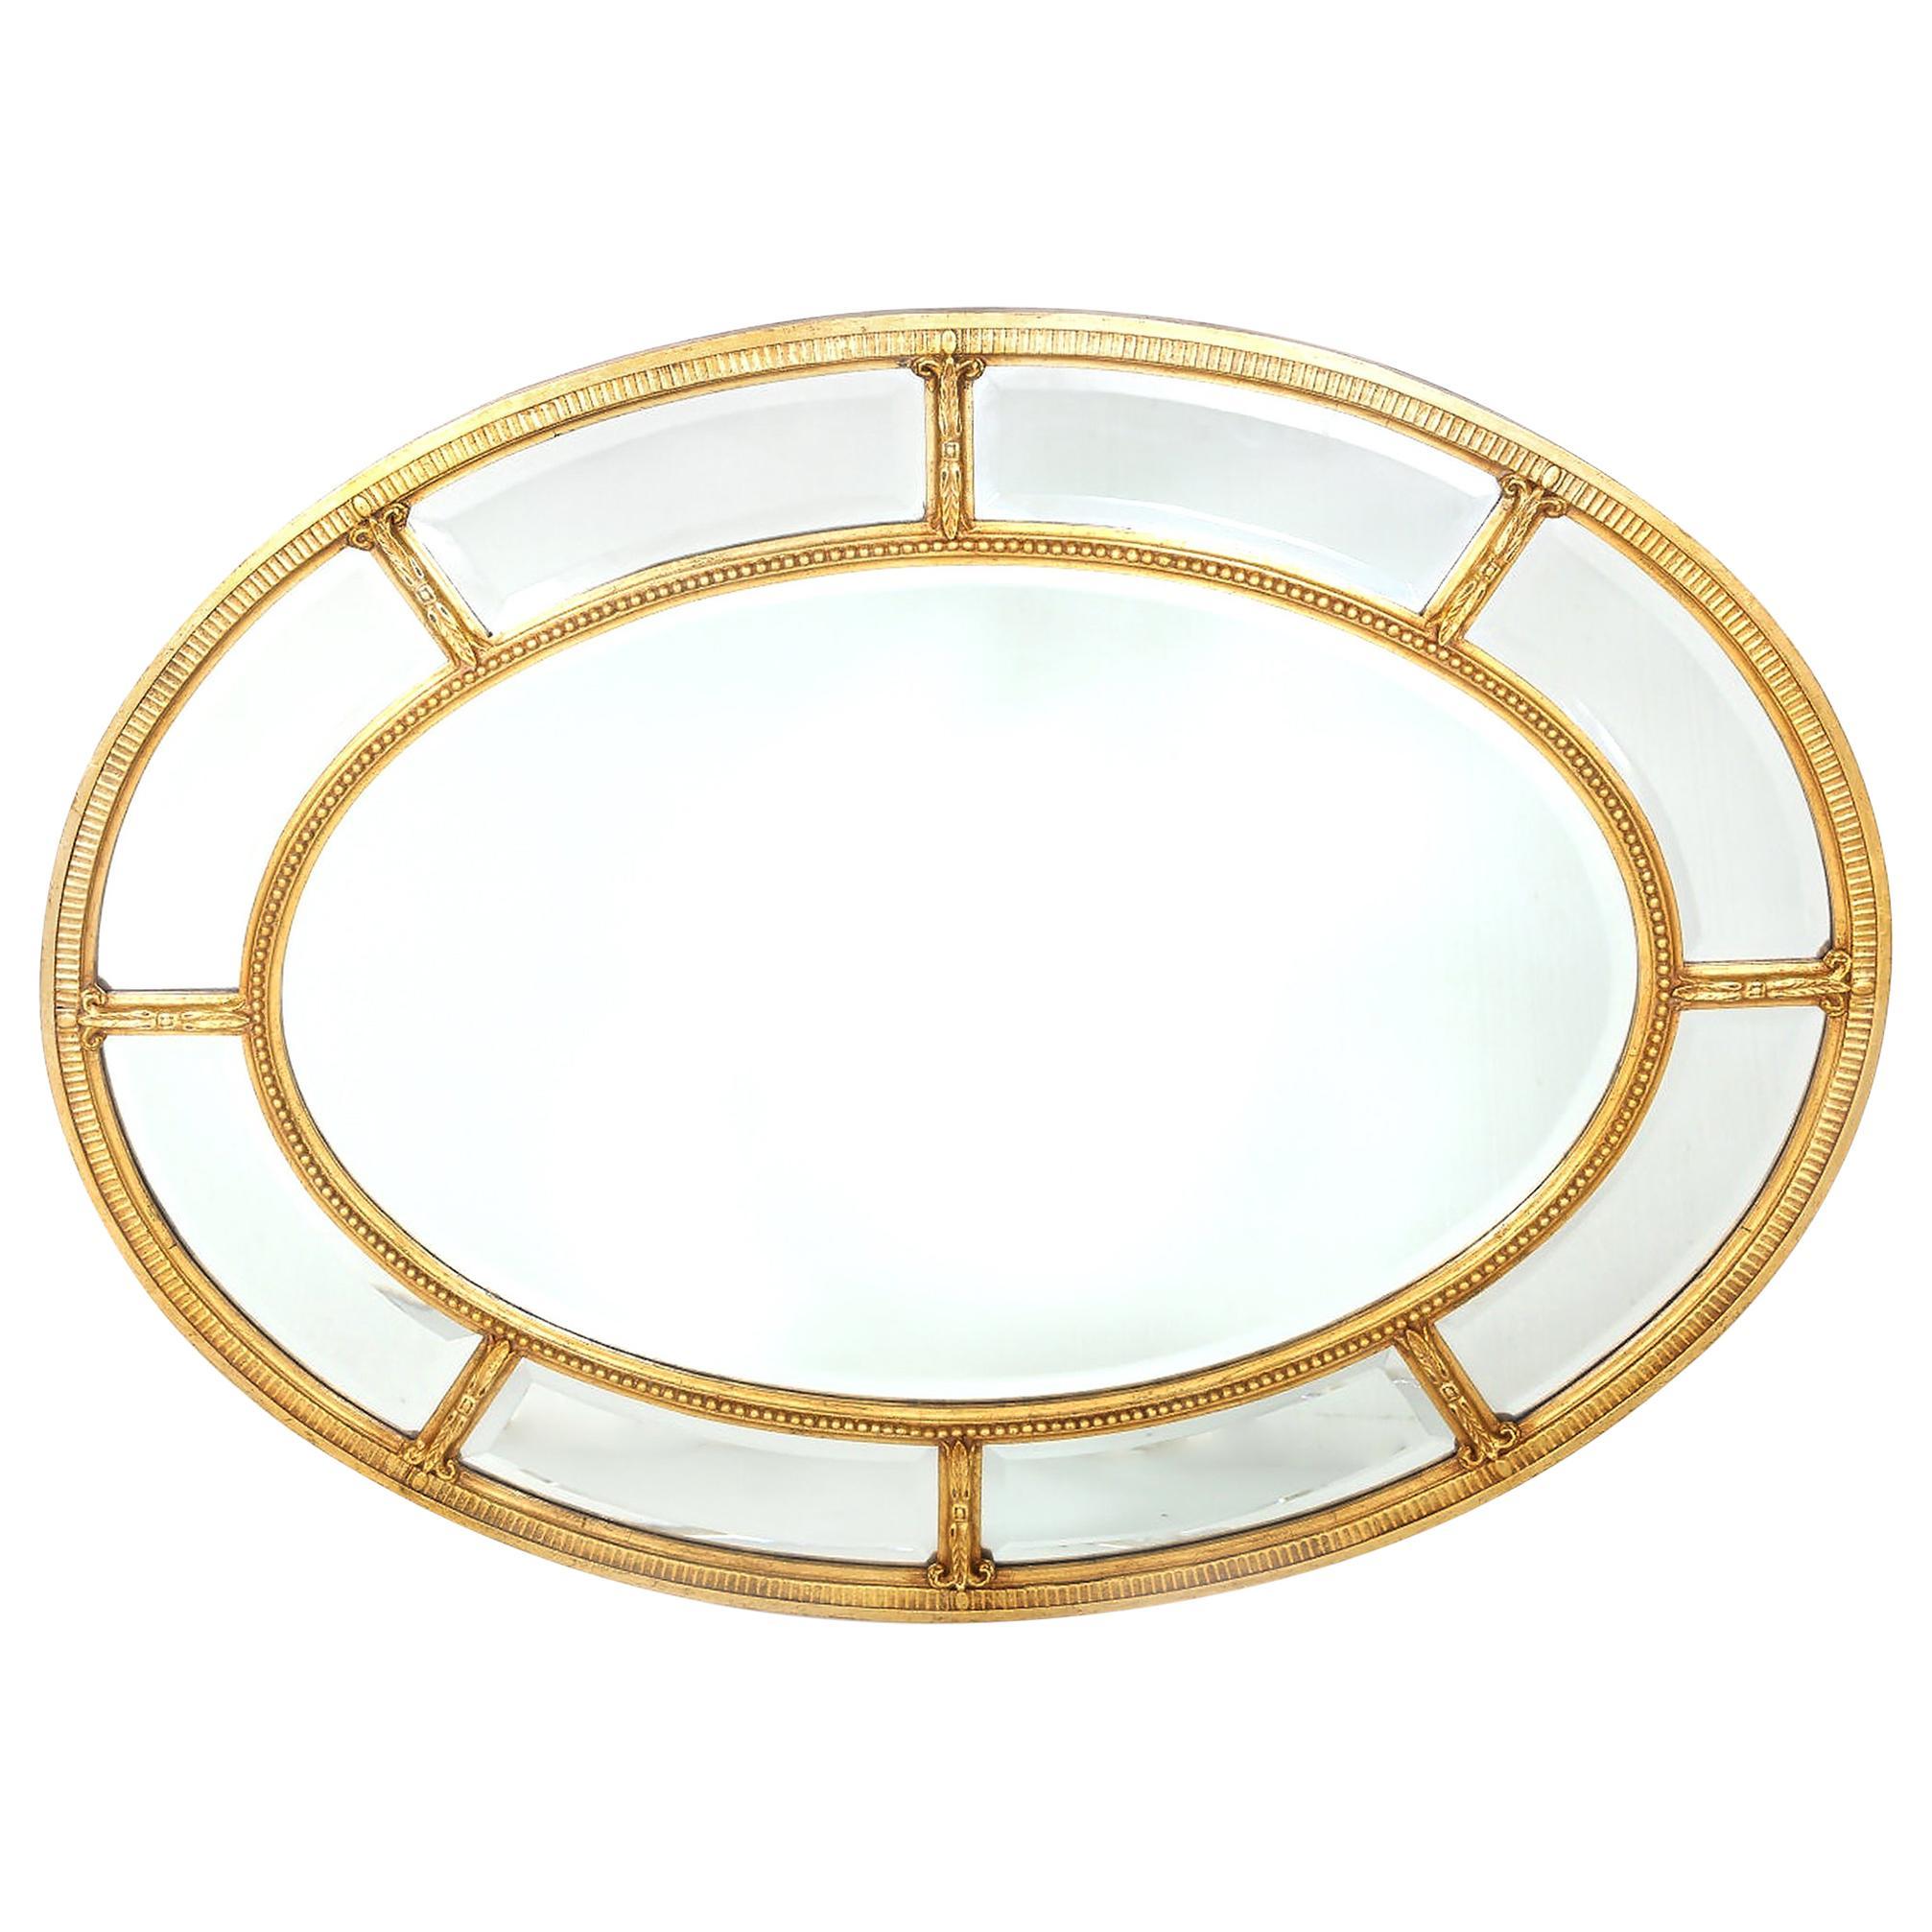 Gilt Wood Framed Oval Shape Beveled Wall Mirror